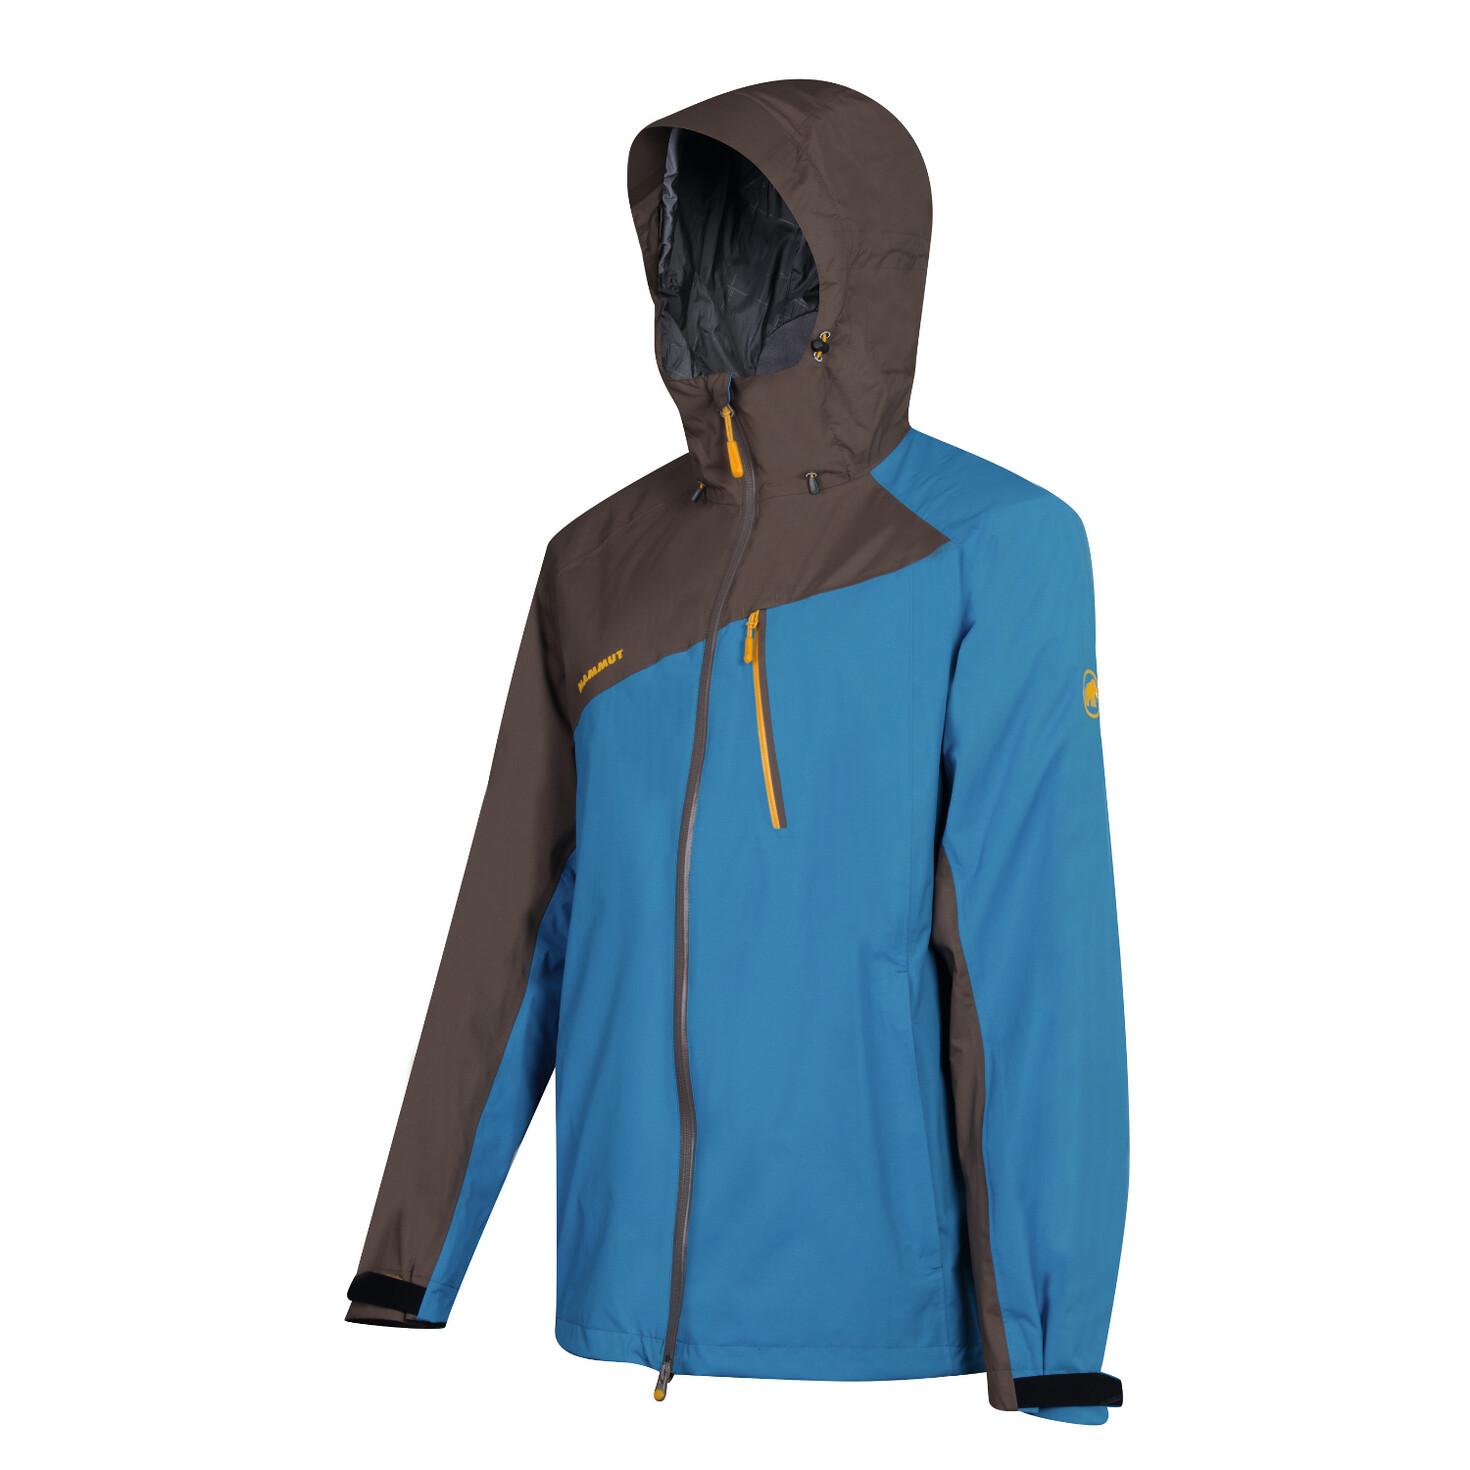 Mammut Creon Jacket Men imperial-dark oak XL jacke~oberteil~Bekleidung~Outdoor~outdoorjacke~outdoorbekleidung~hardshelljacke~hardshell jacke